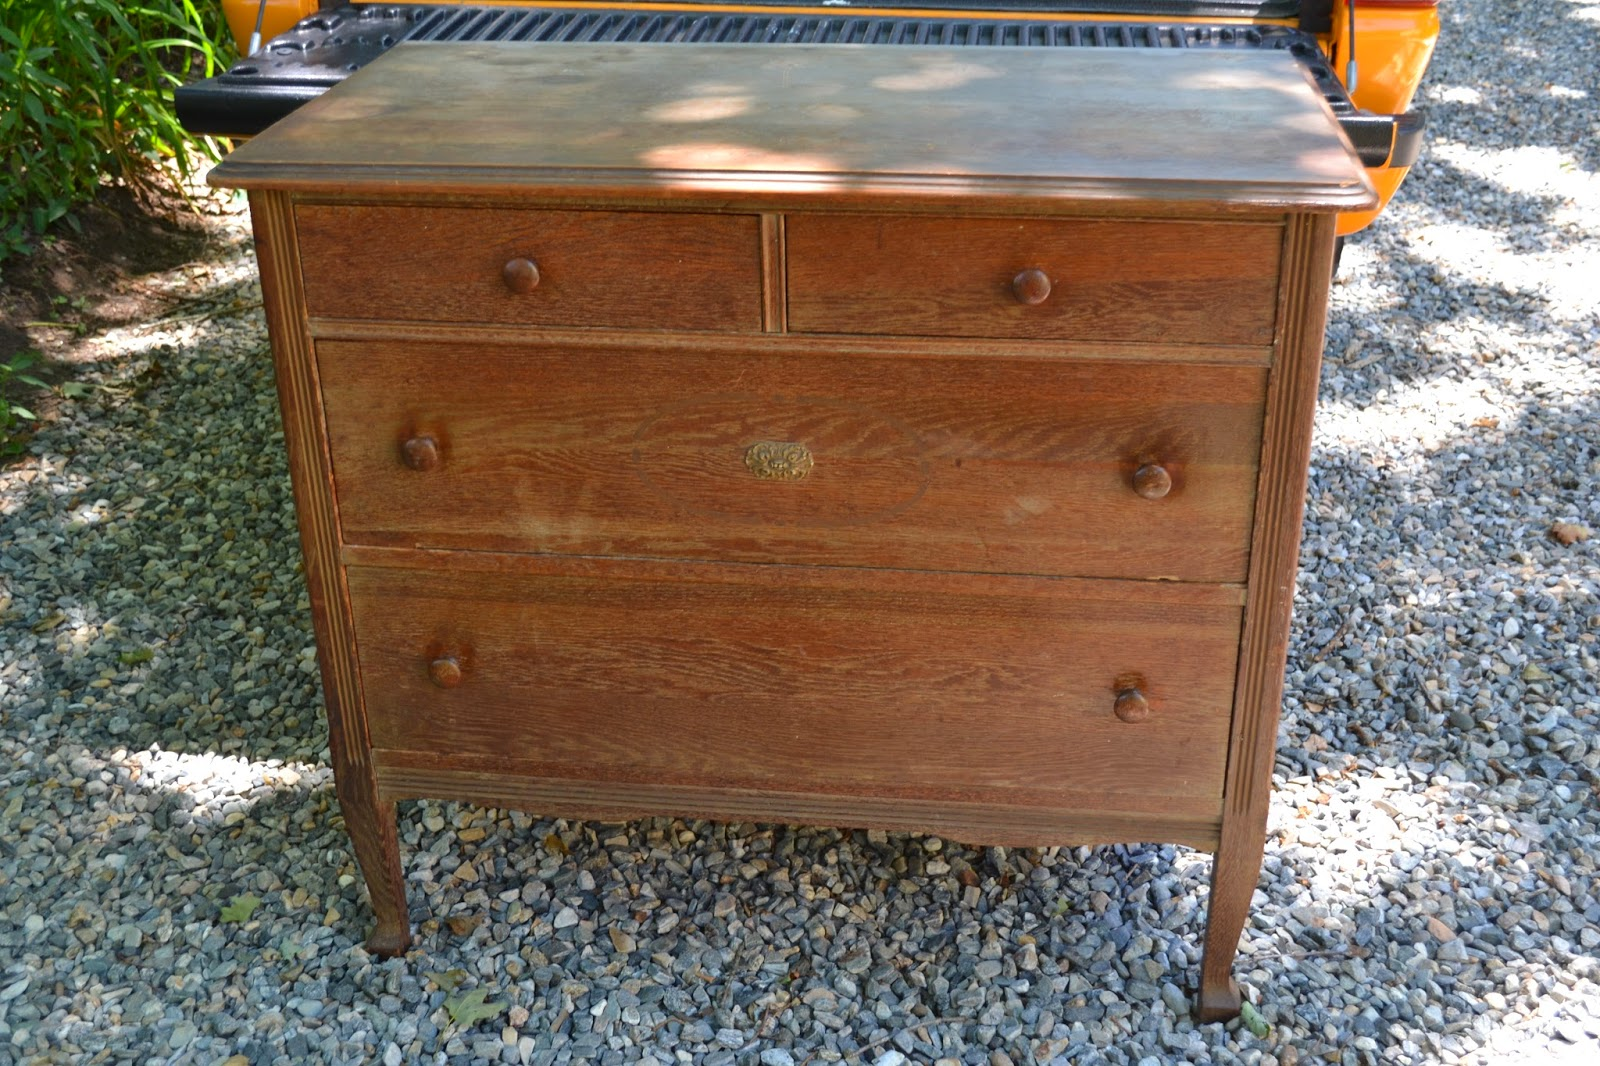 Turn A Dresser Into A Kitchen Island: Heir And Space: Antique Dresser Turned Cottage Kitchen Island